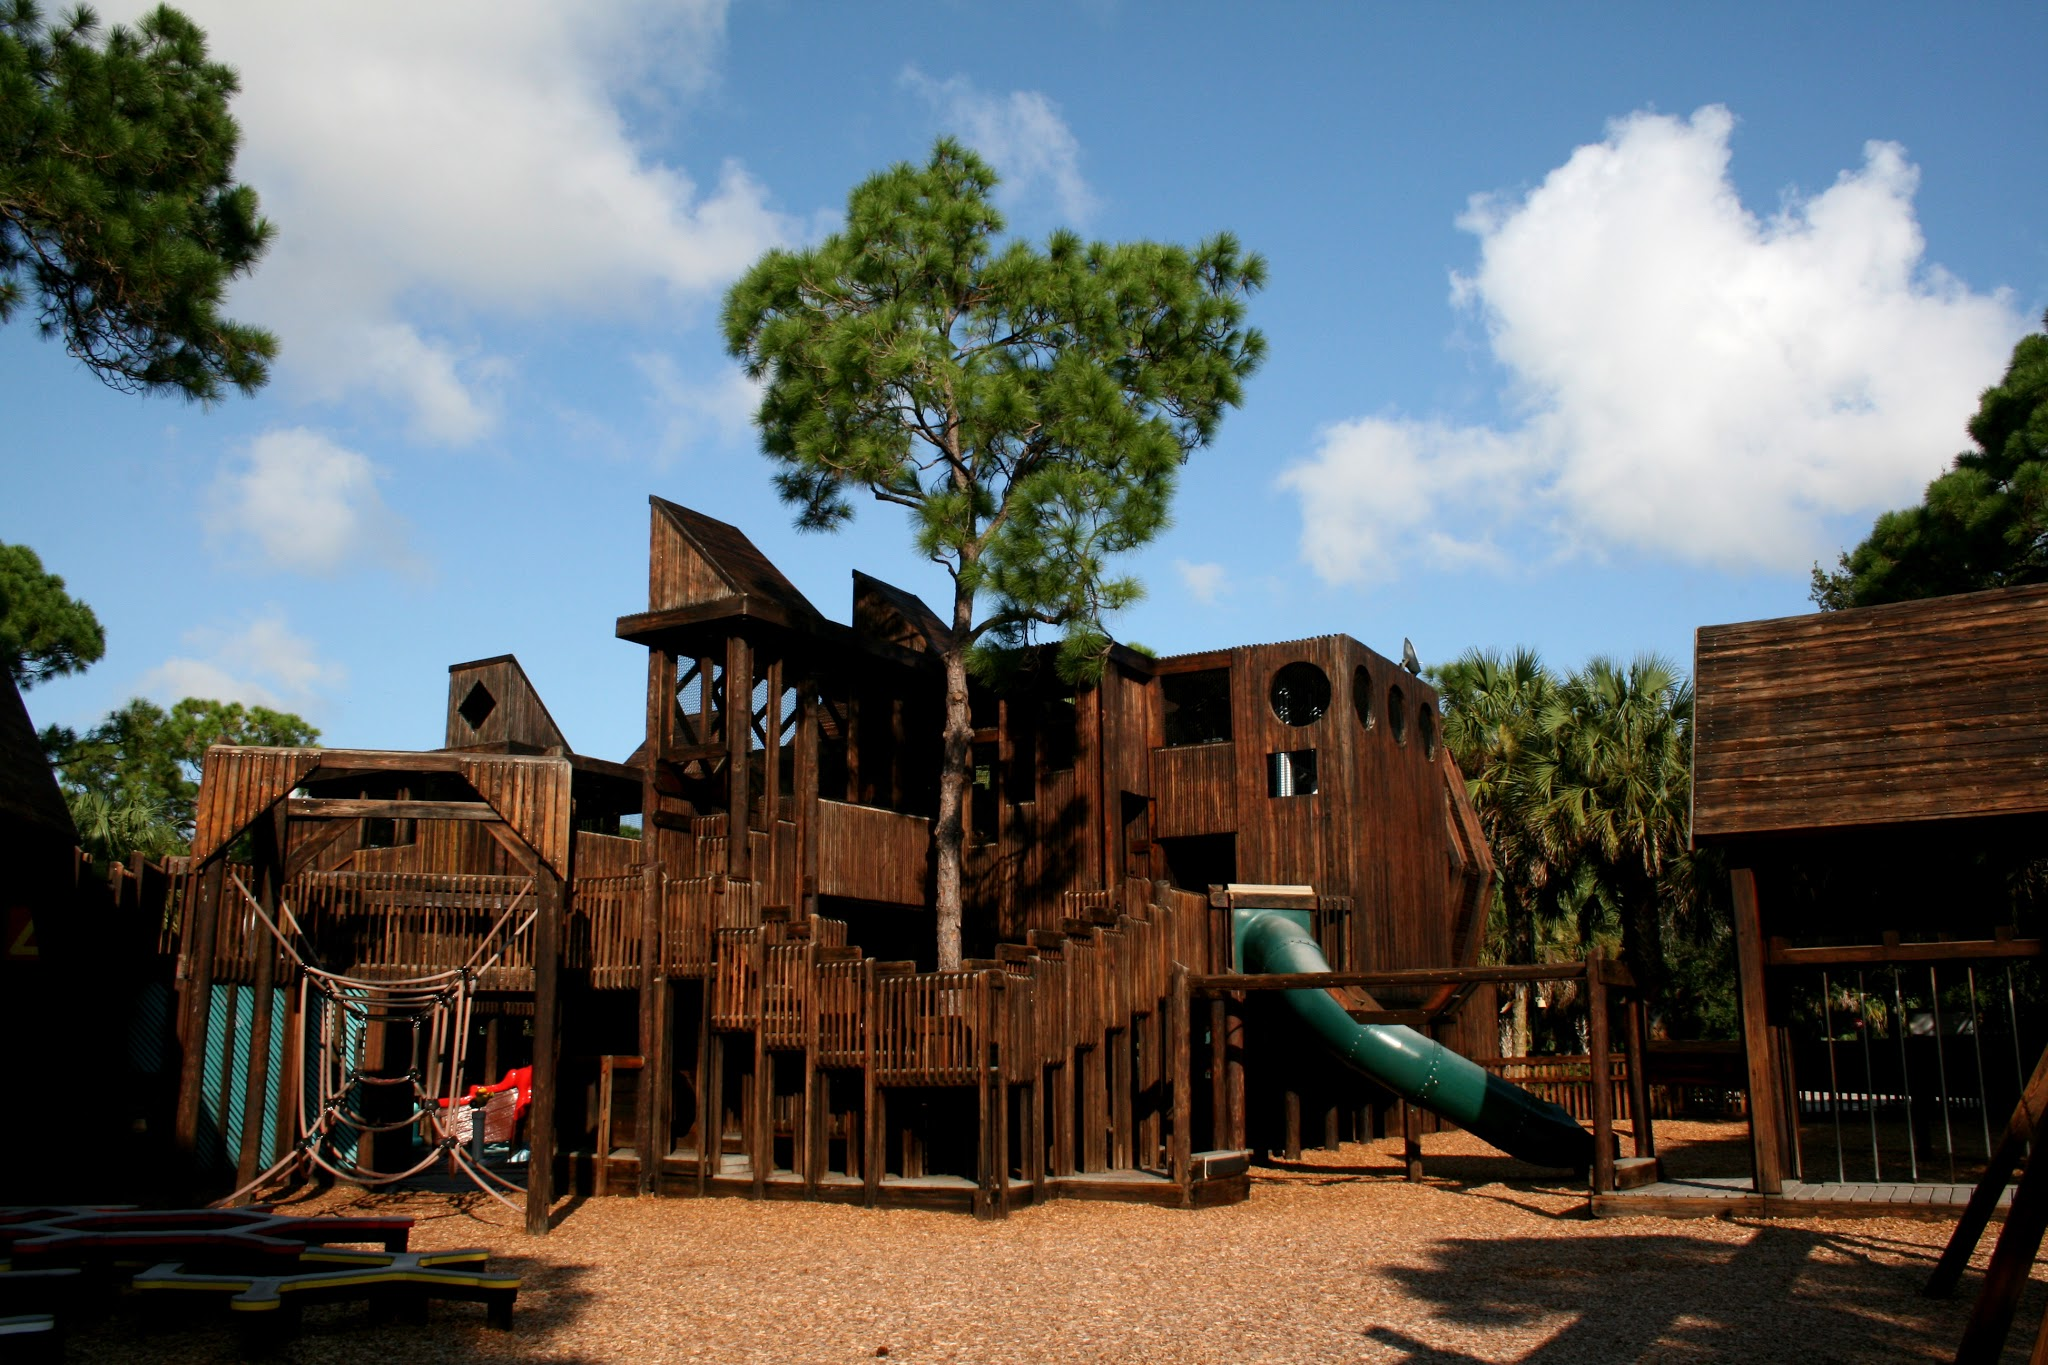 Sugar Sand Park - Boca Raton Regulations